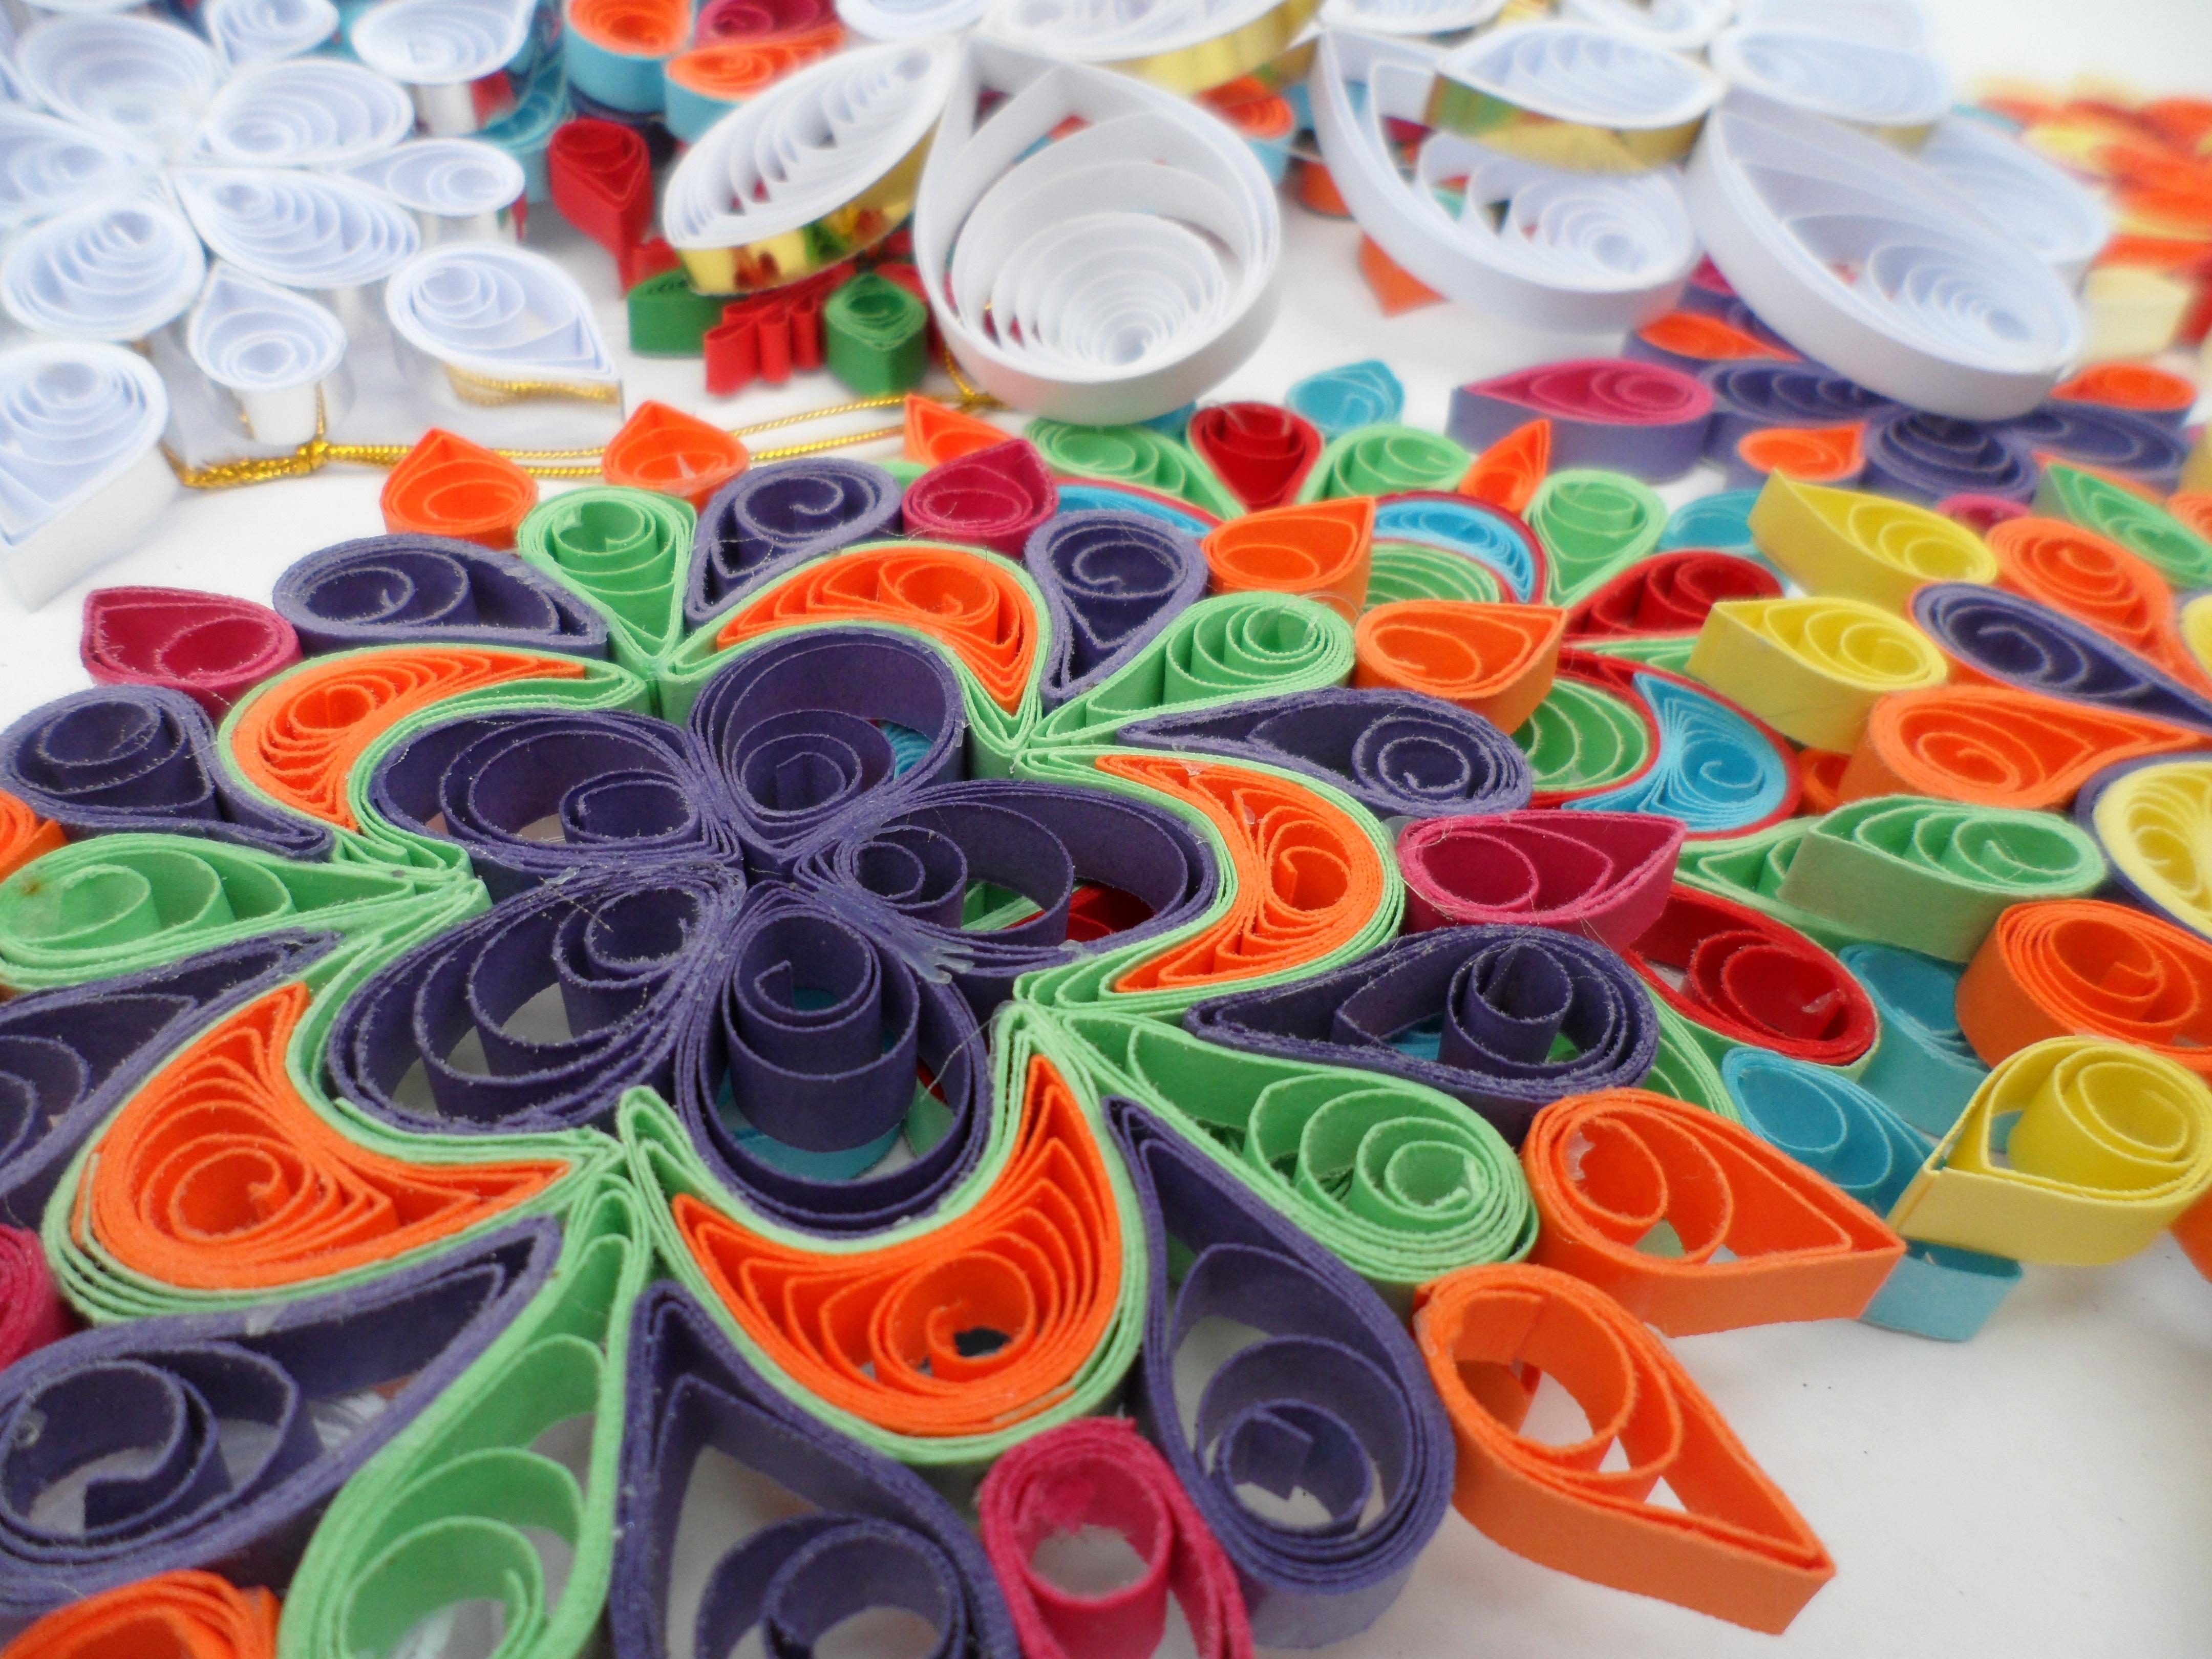 Free Images Wheel Flower Petal Pattern Color Circle Art